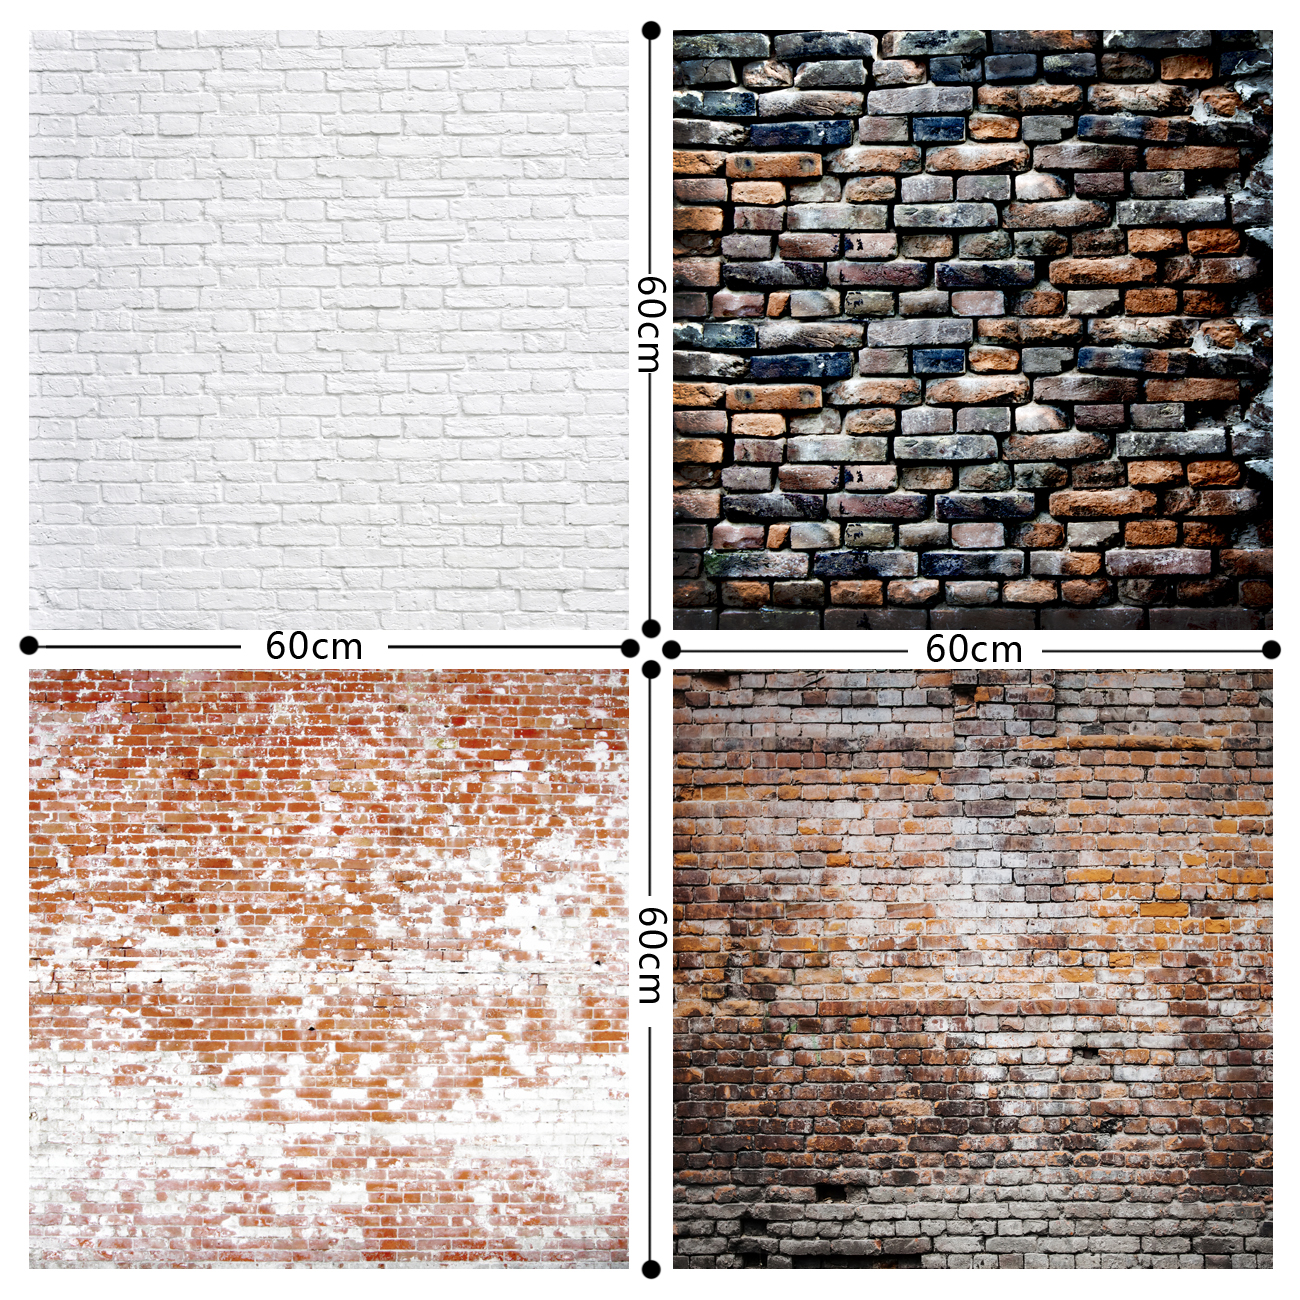 HUAYI Brick Paper Backdrop Vinyl Backdrop Brick Wall Photography Backdrops Photo Props Background Brick 4 pairs 0.6x0.6m GY-019 shengyongbao 300cm 200cm vinyl custom photography backdrops brick wall theme photo studio props photography background brw 12